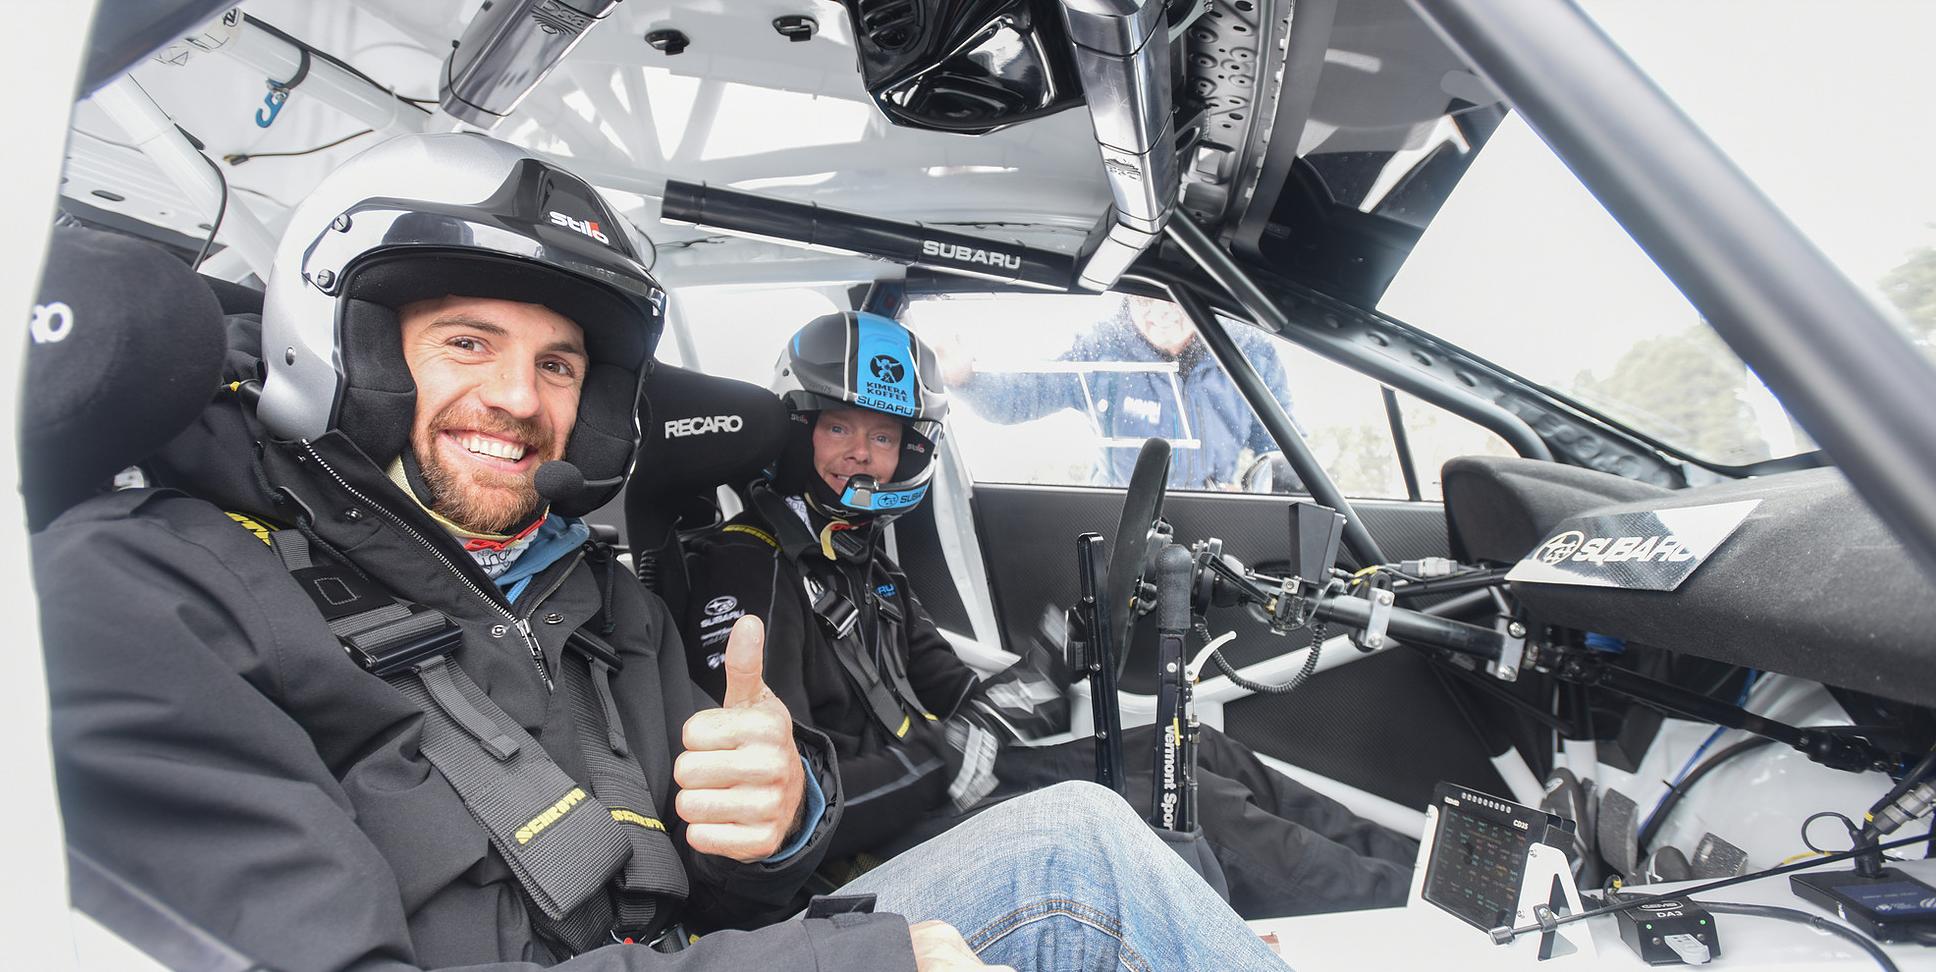 A passenger enjoys his 2018 Subaru Winter Experience with Patrik Sandell